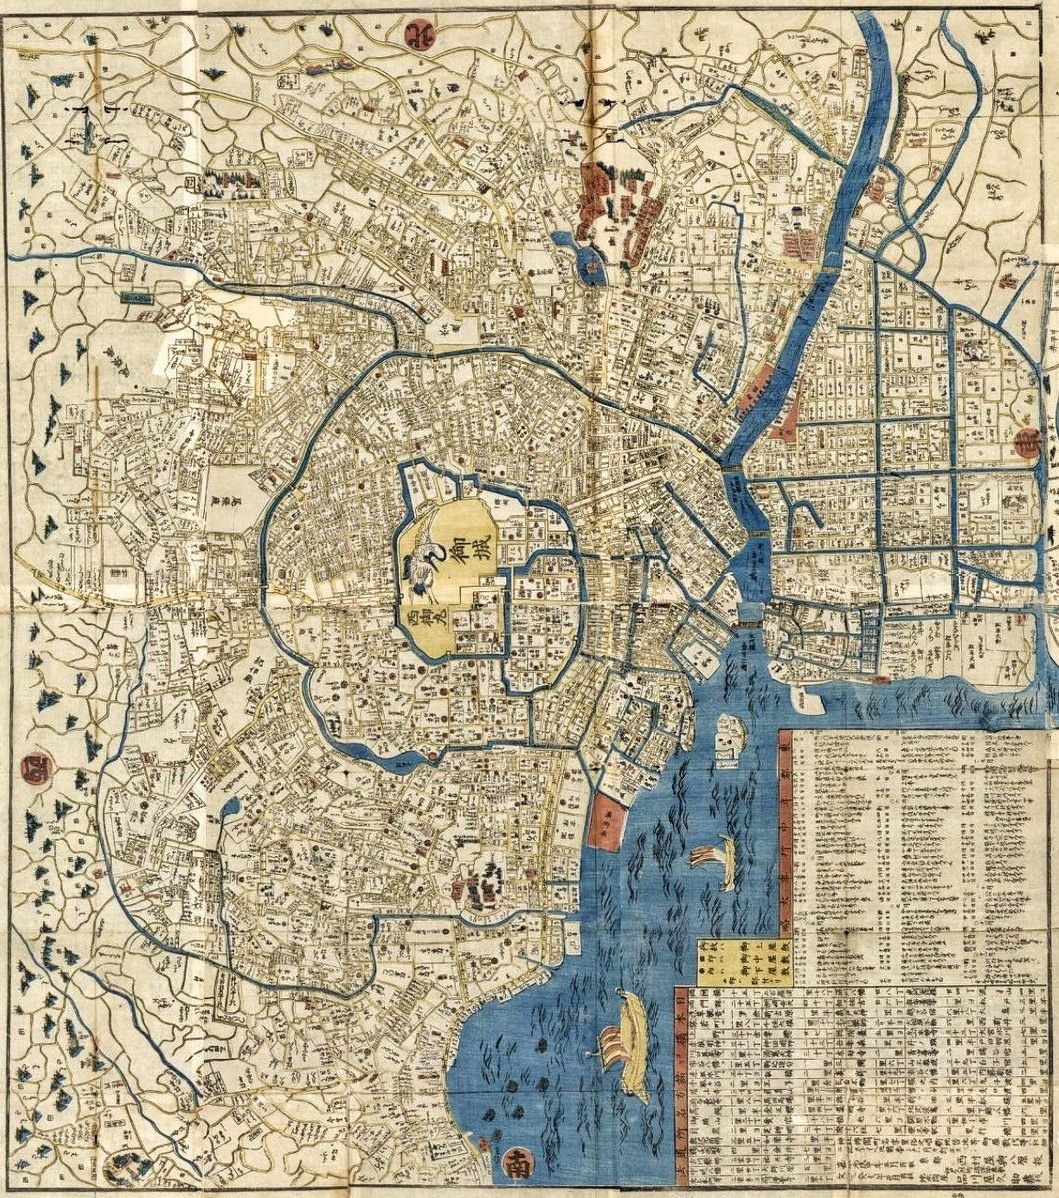 1863 Japanese Map Of Tokyo By Nishimuraya Yohachi Tokyo Map Vintage City Map Art Illustrated Map Tokyo Map